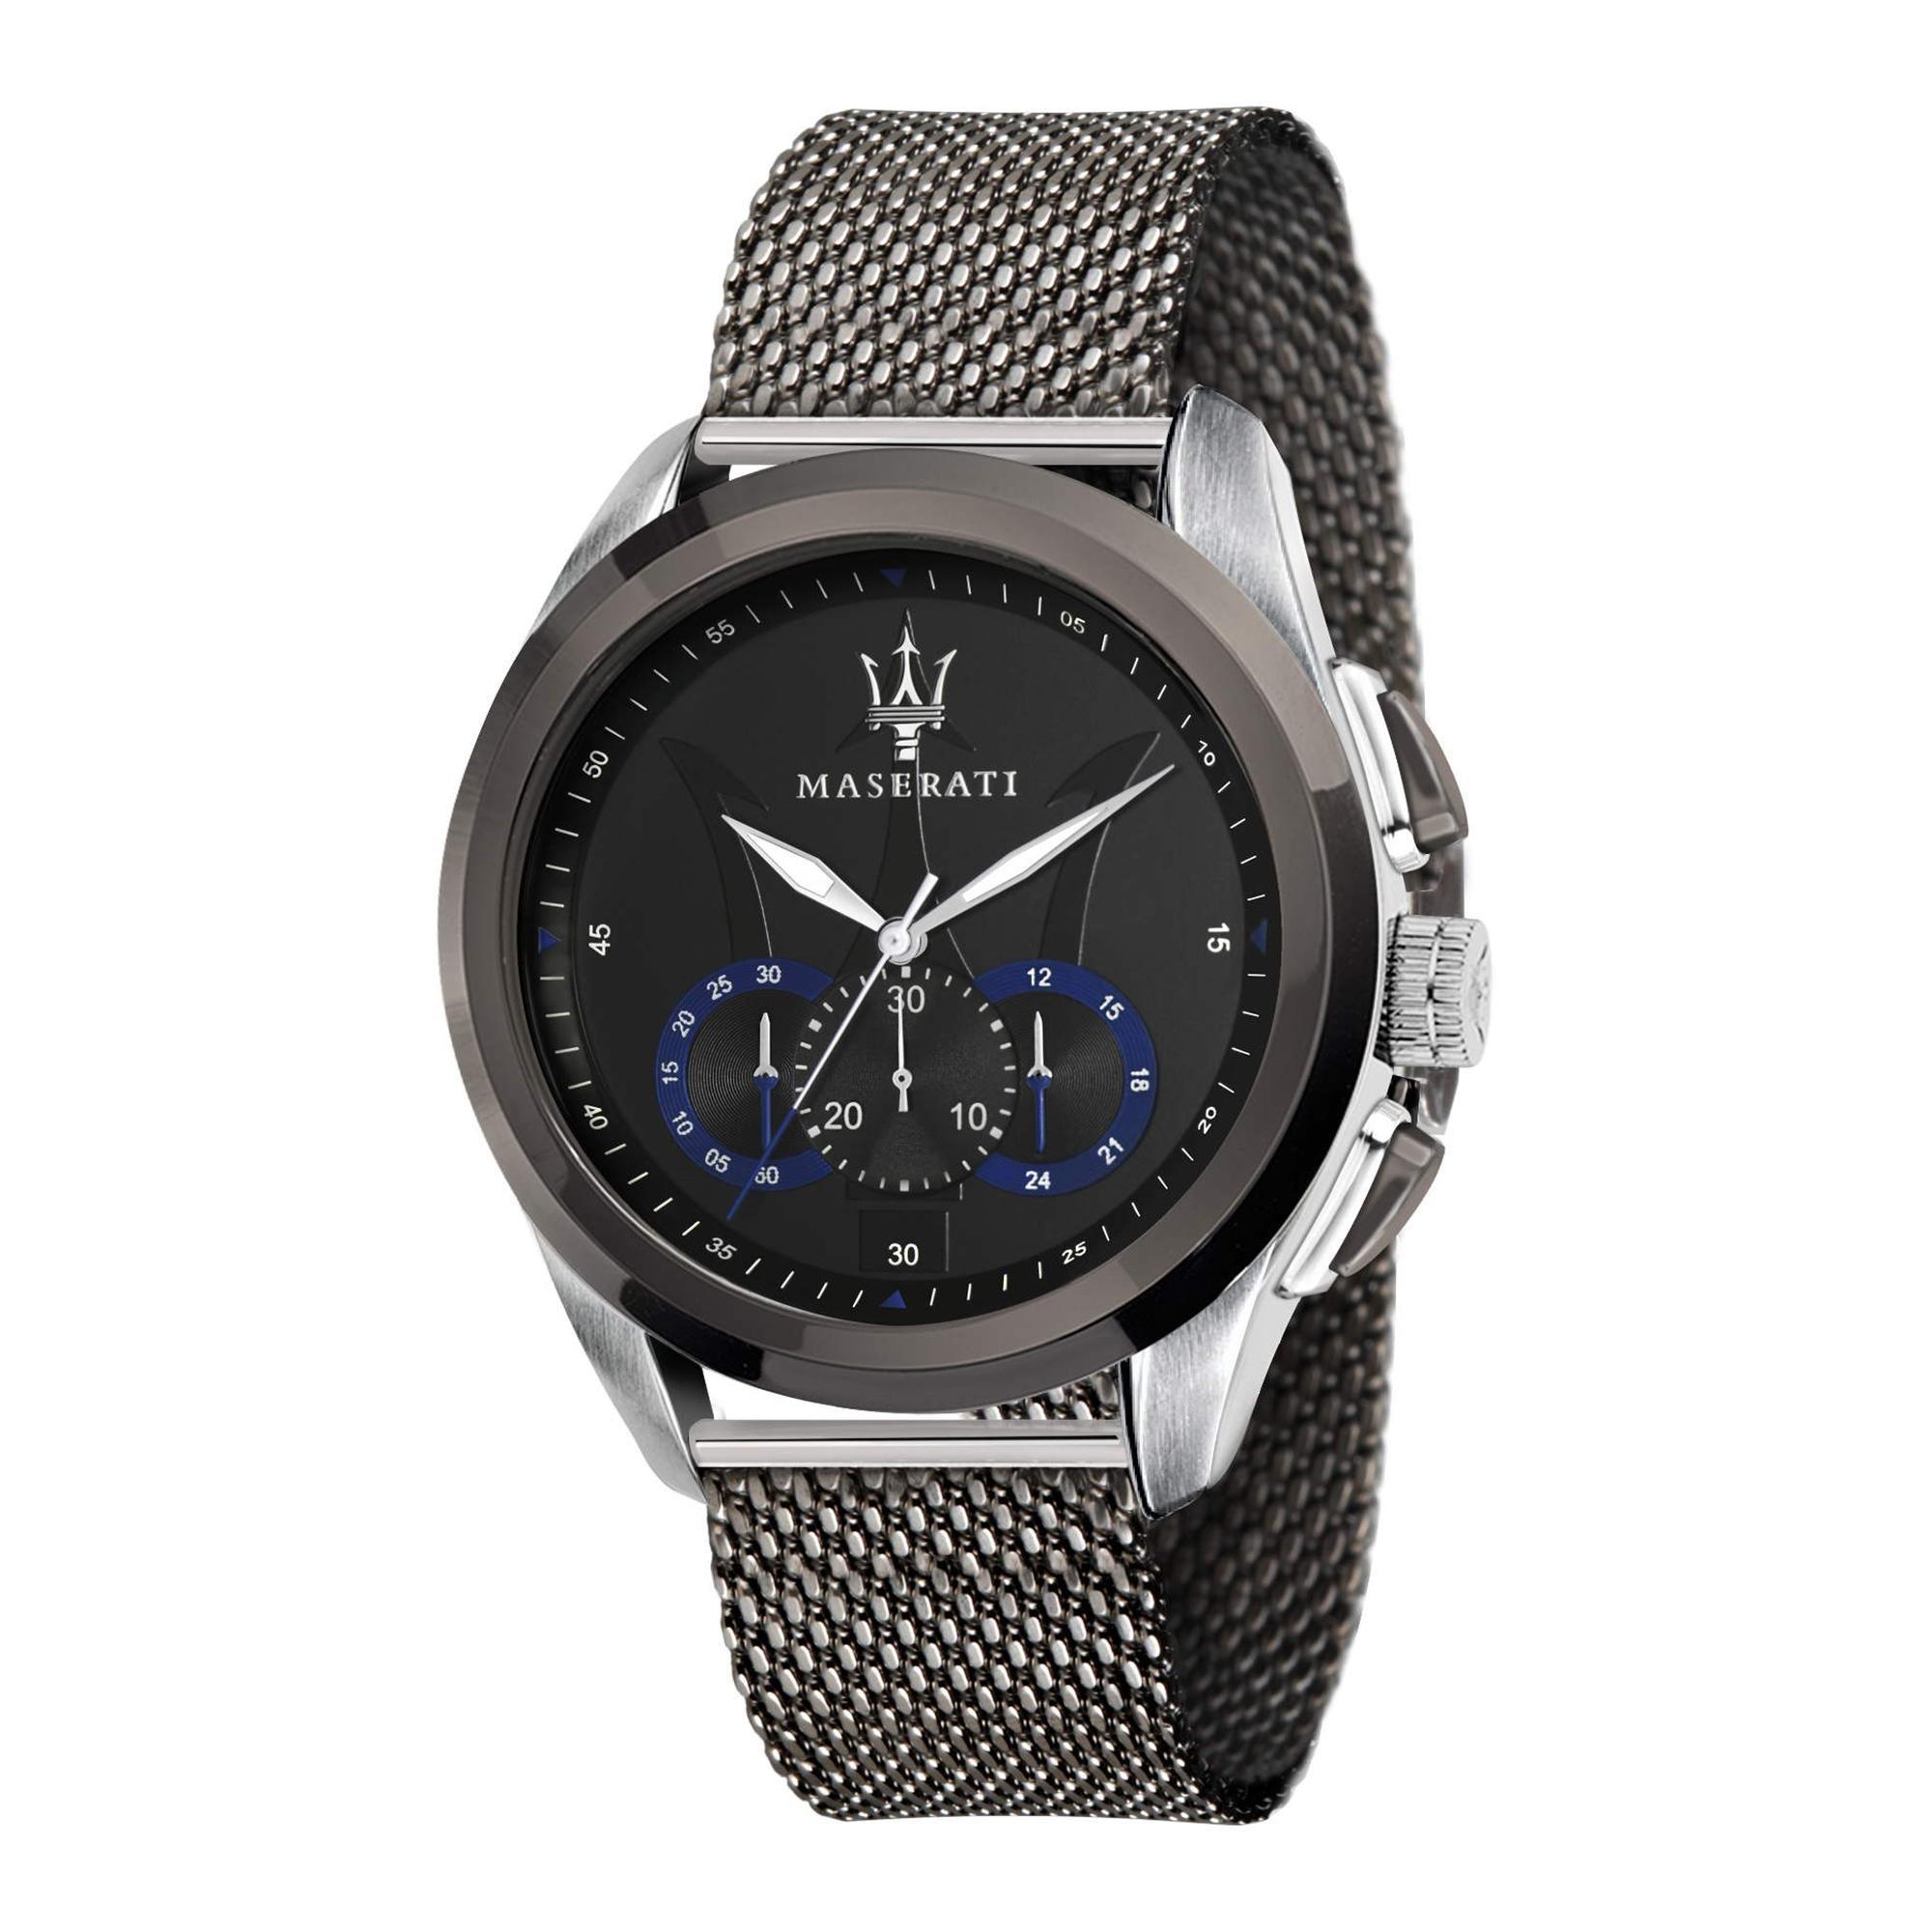 Reloj para Hombre, Colección Traguardo, Movimiento de Cuarzo, cronógrafo,